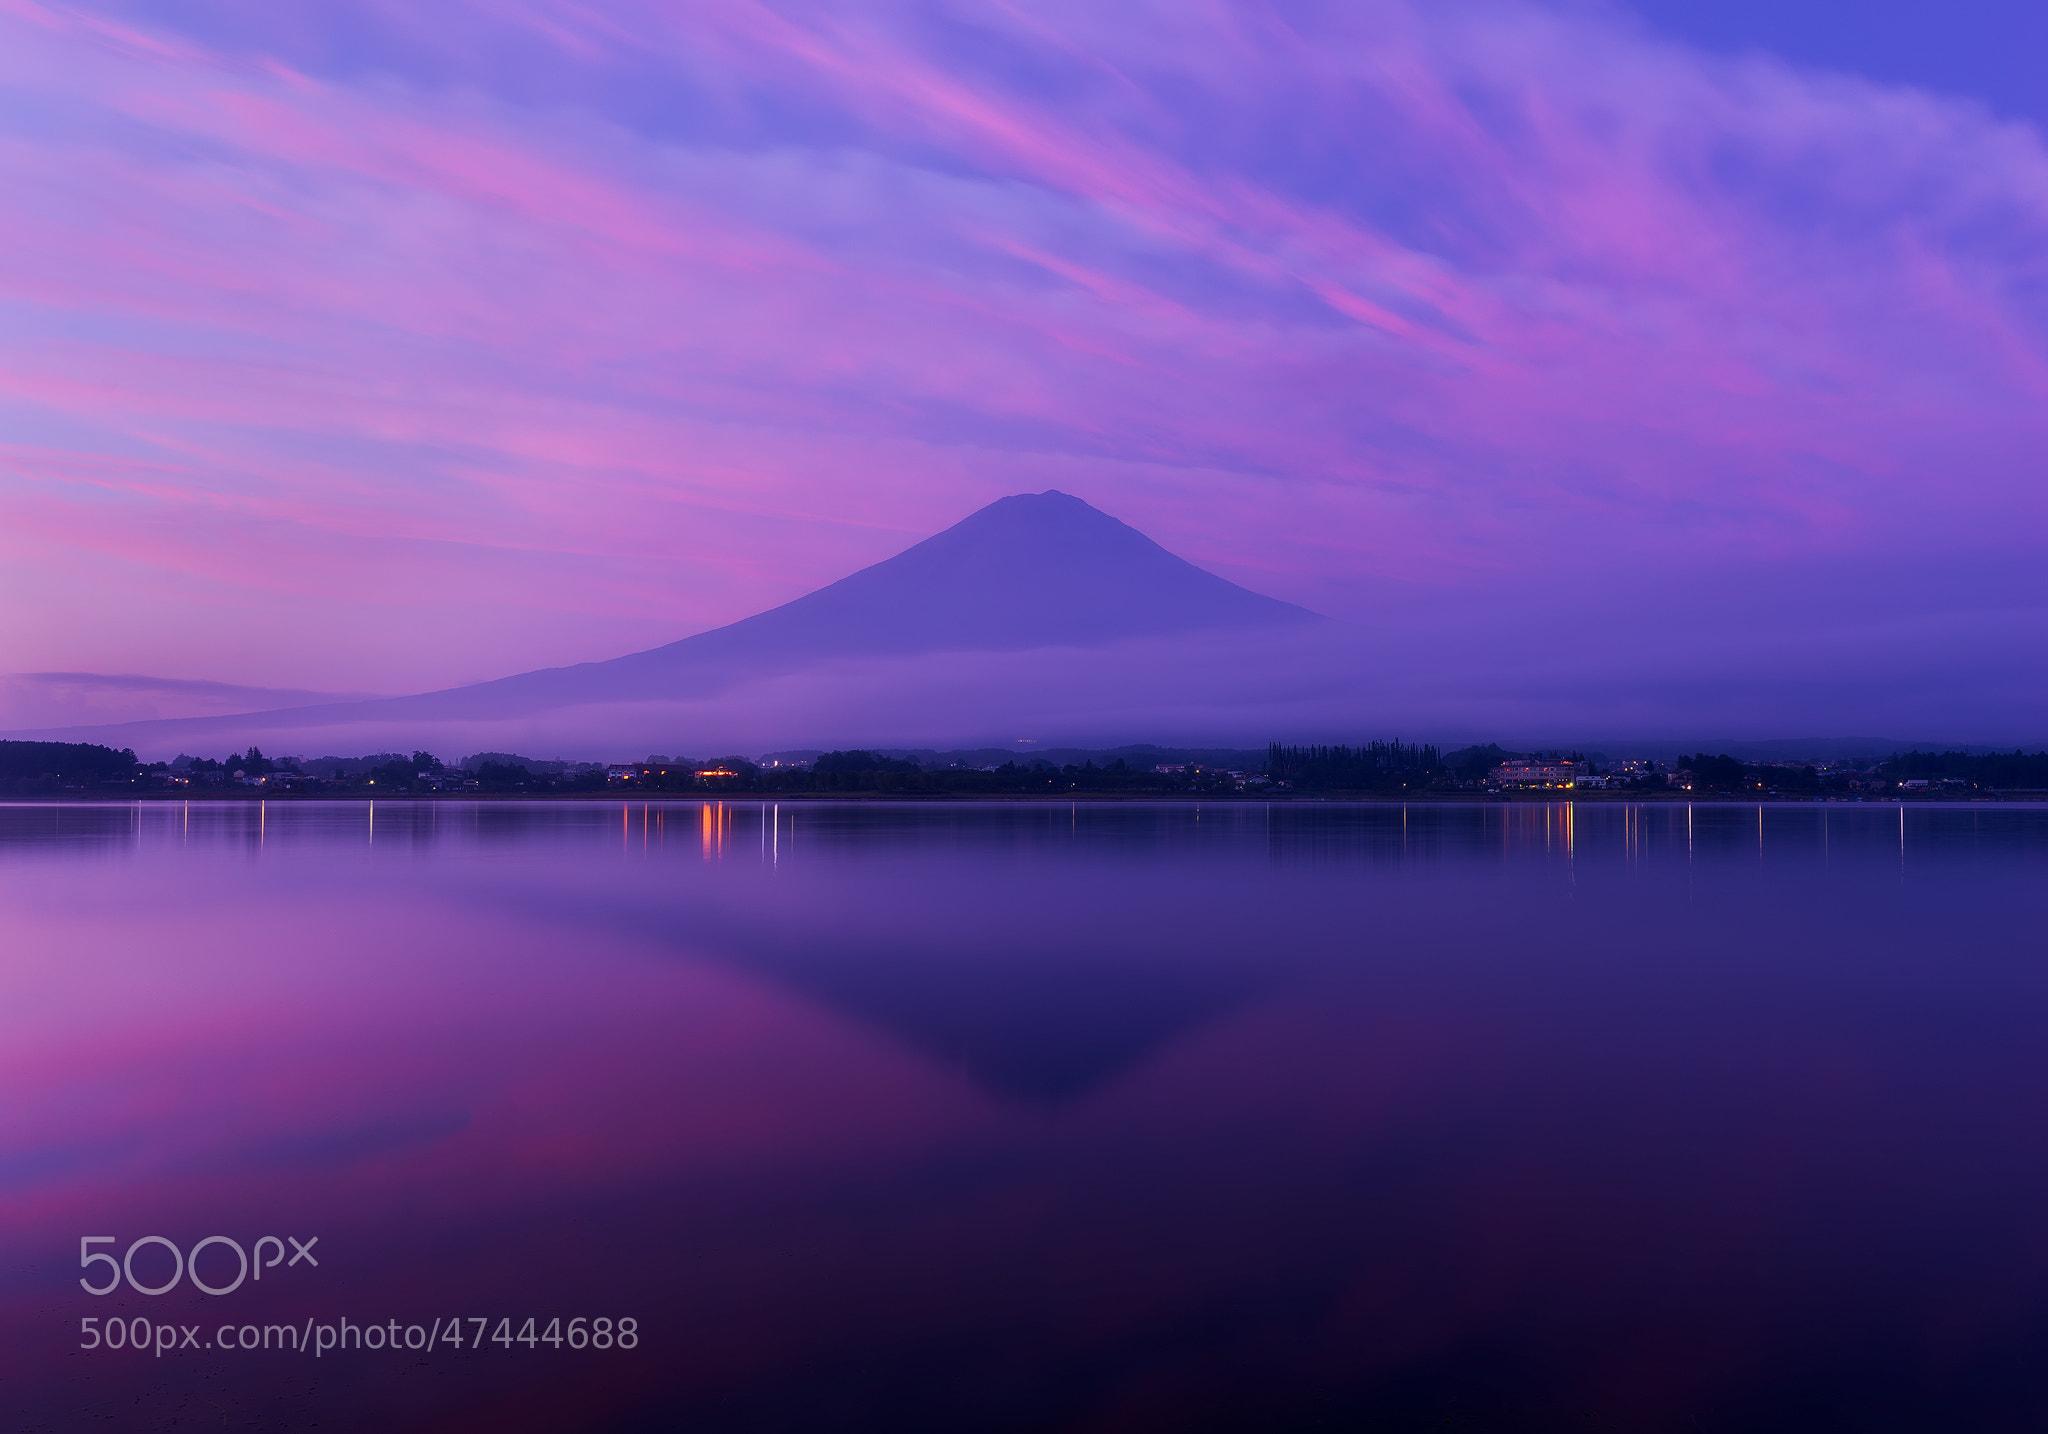 Photograph Purple Fuji Sunrise by Agustin Rafael Reyes on 500px